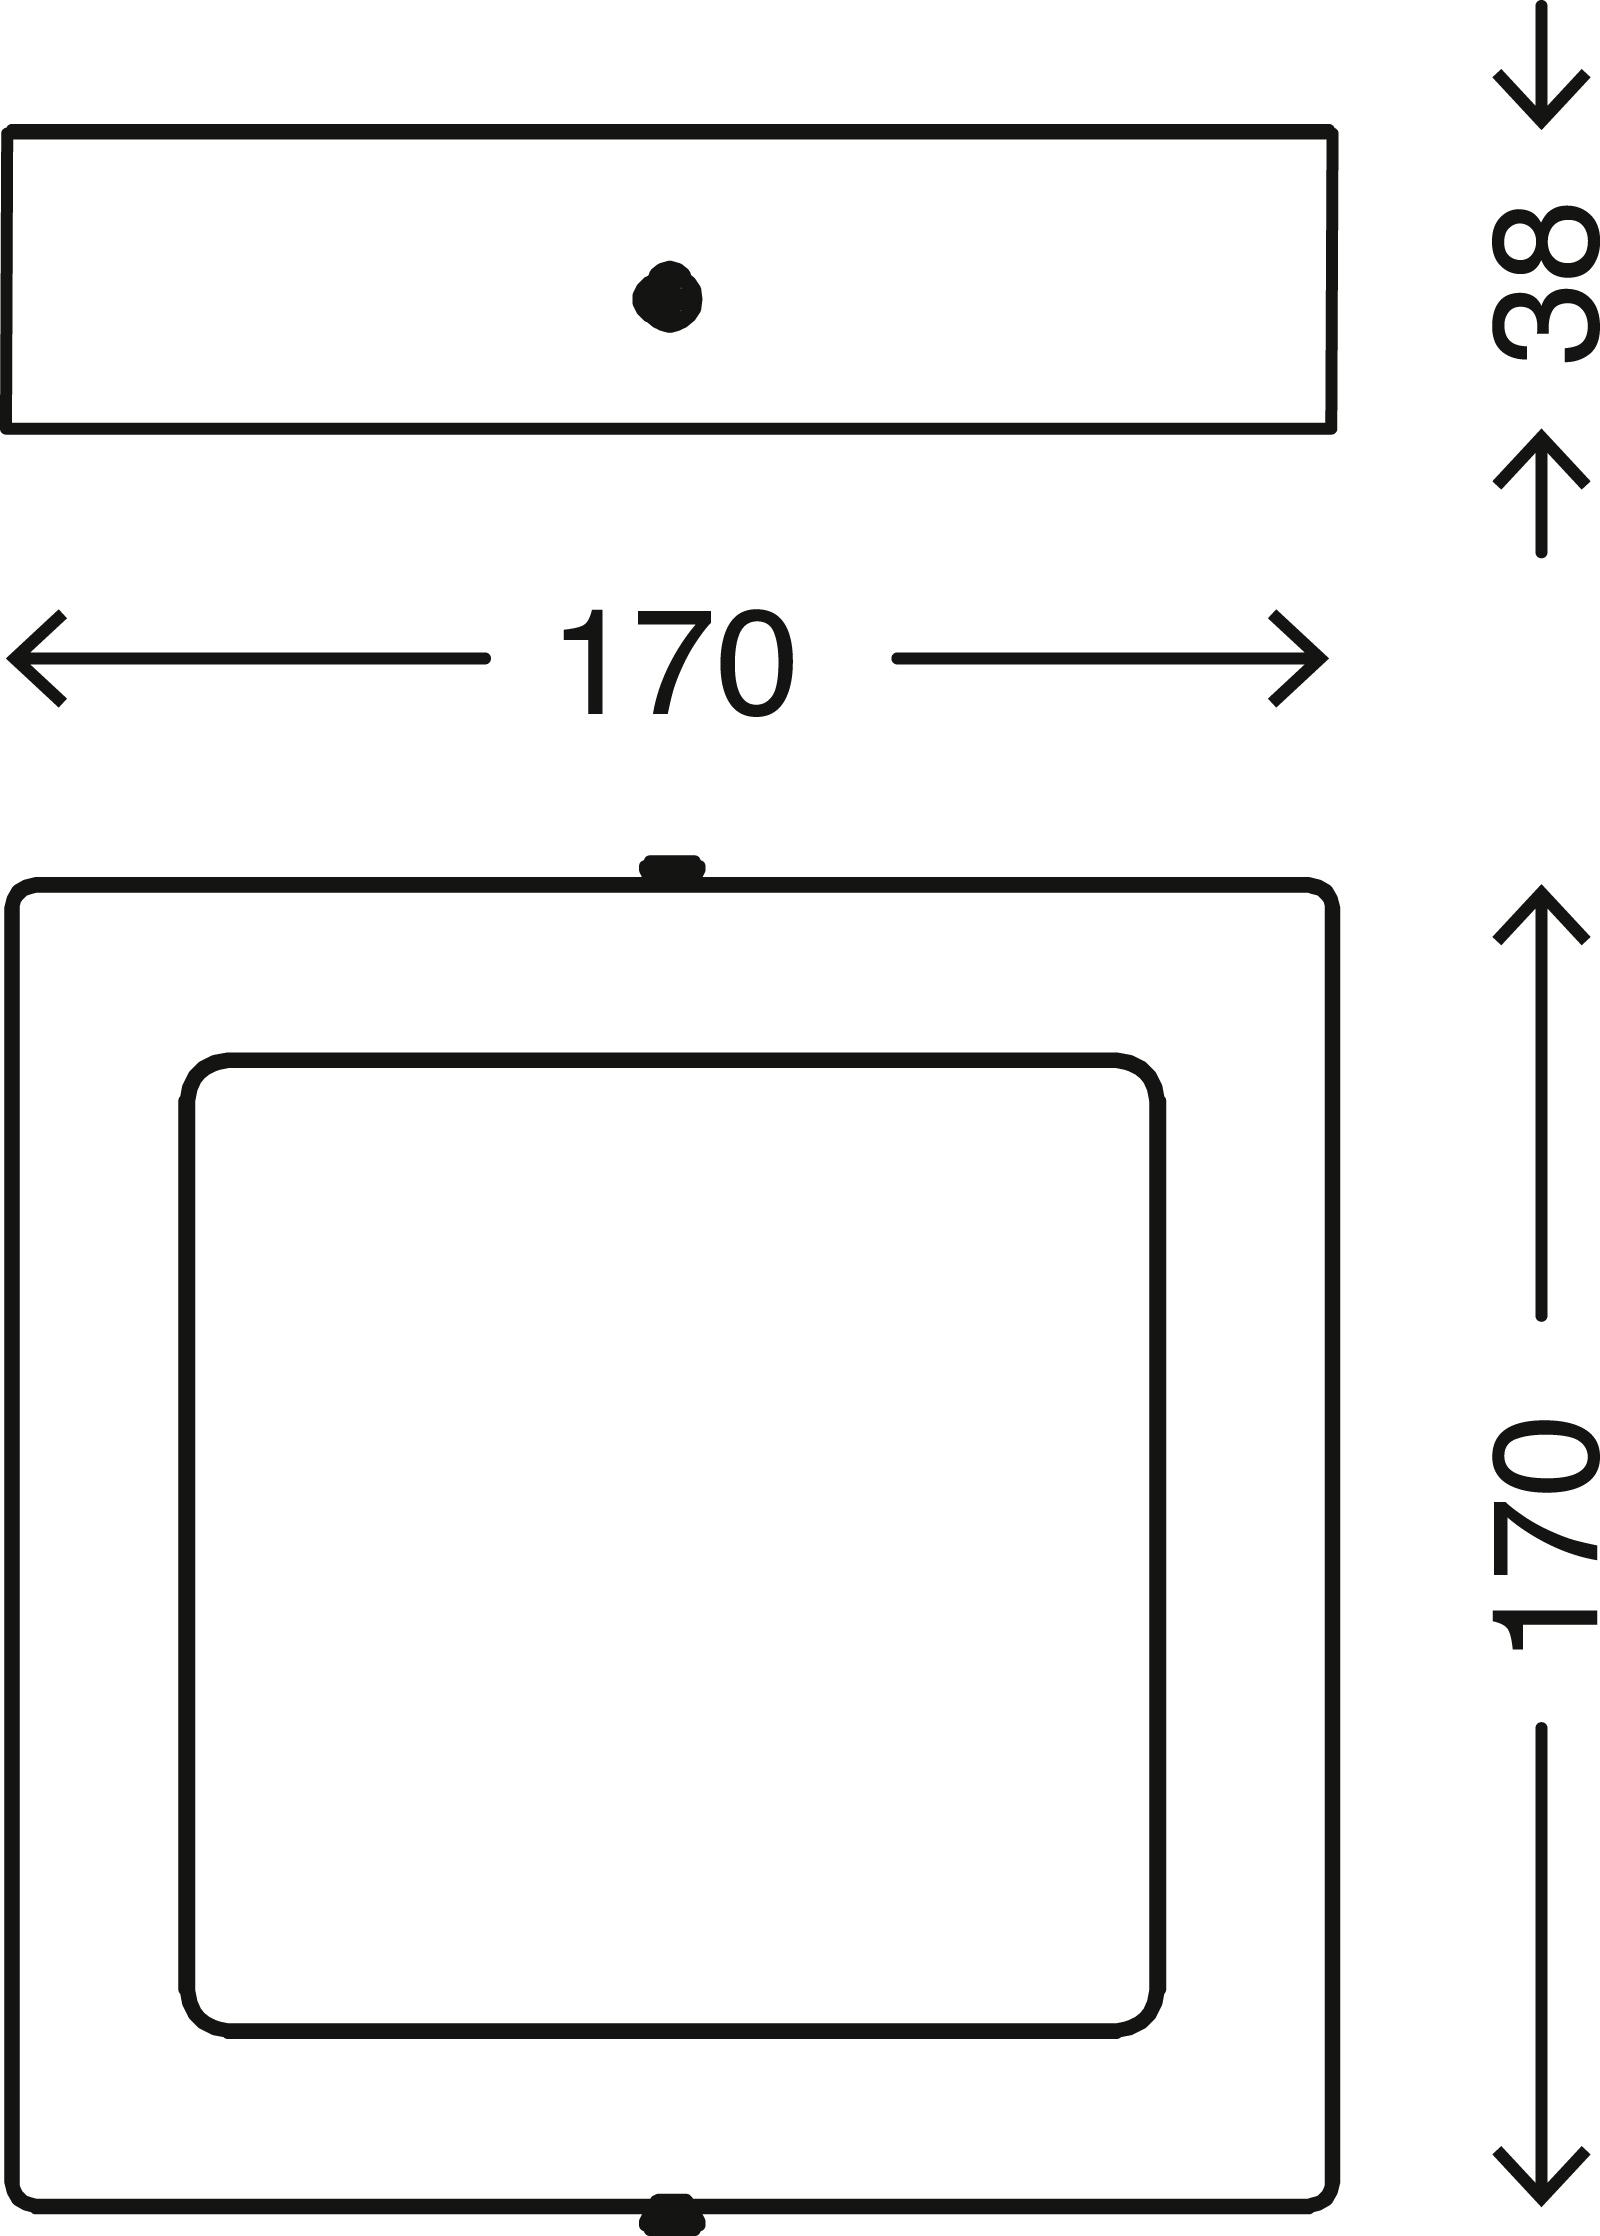 TELEFUNKEN Smart LED Aufbauleuchte, 17 cm, 12 W, Matt-Nickel